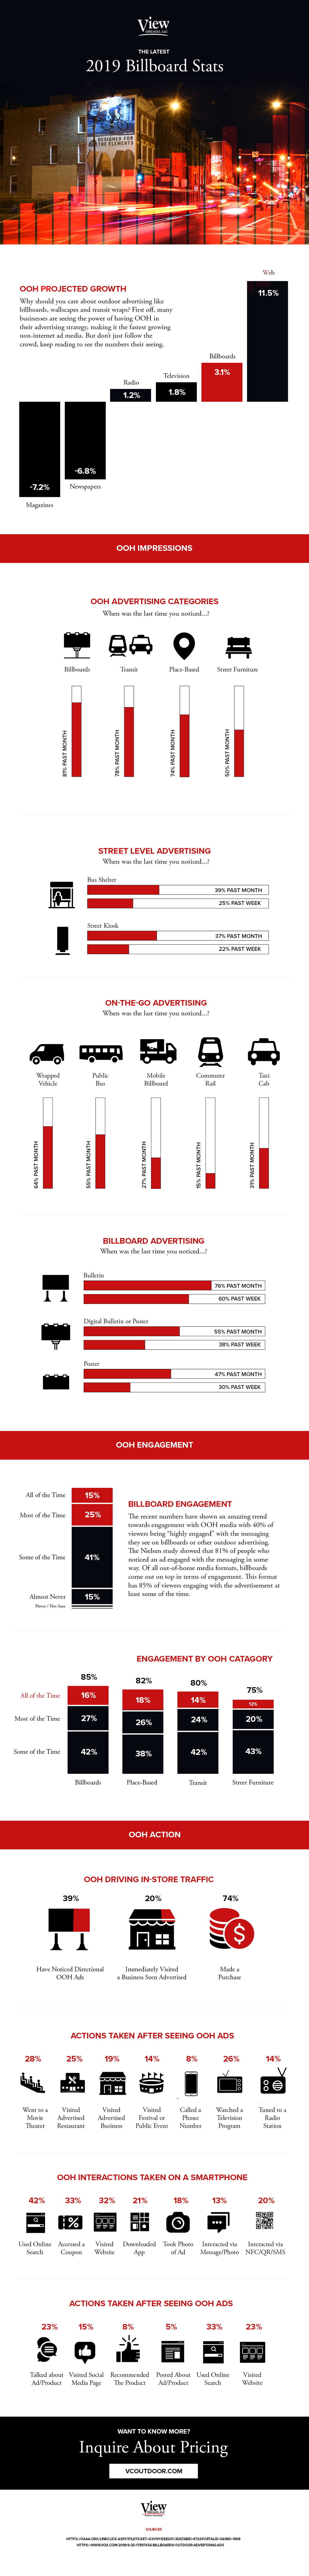 Billboard Stats Infographic - Infographic.jpg